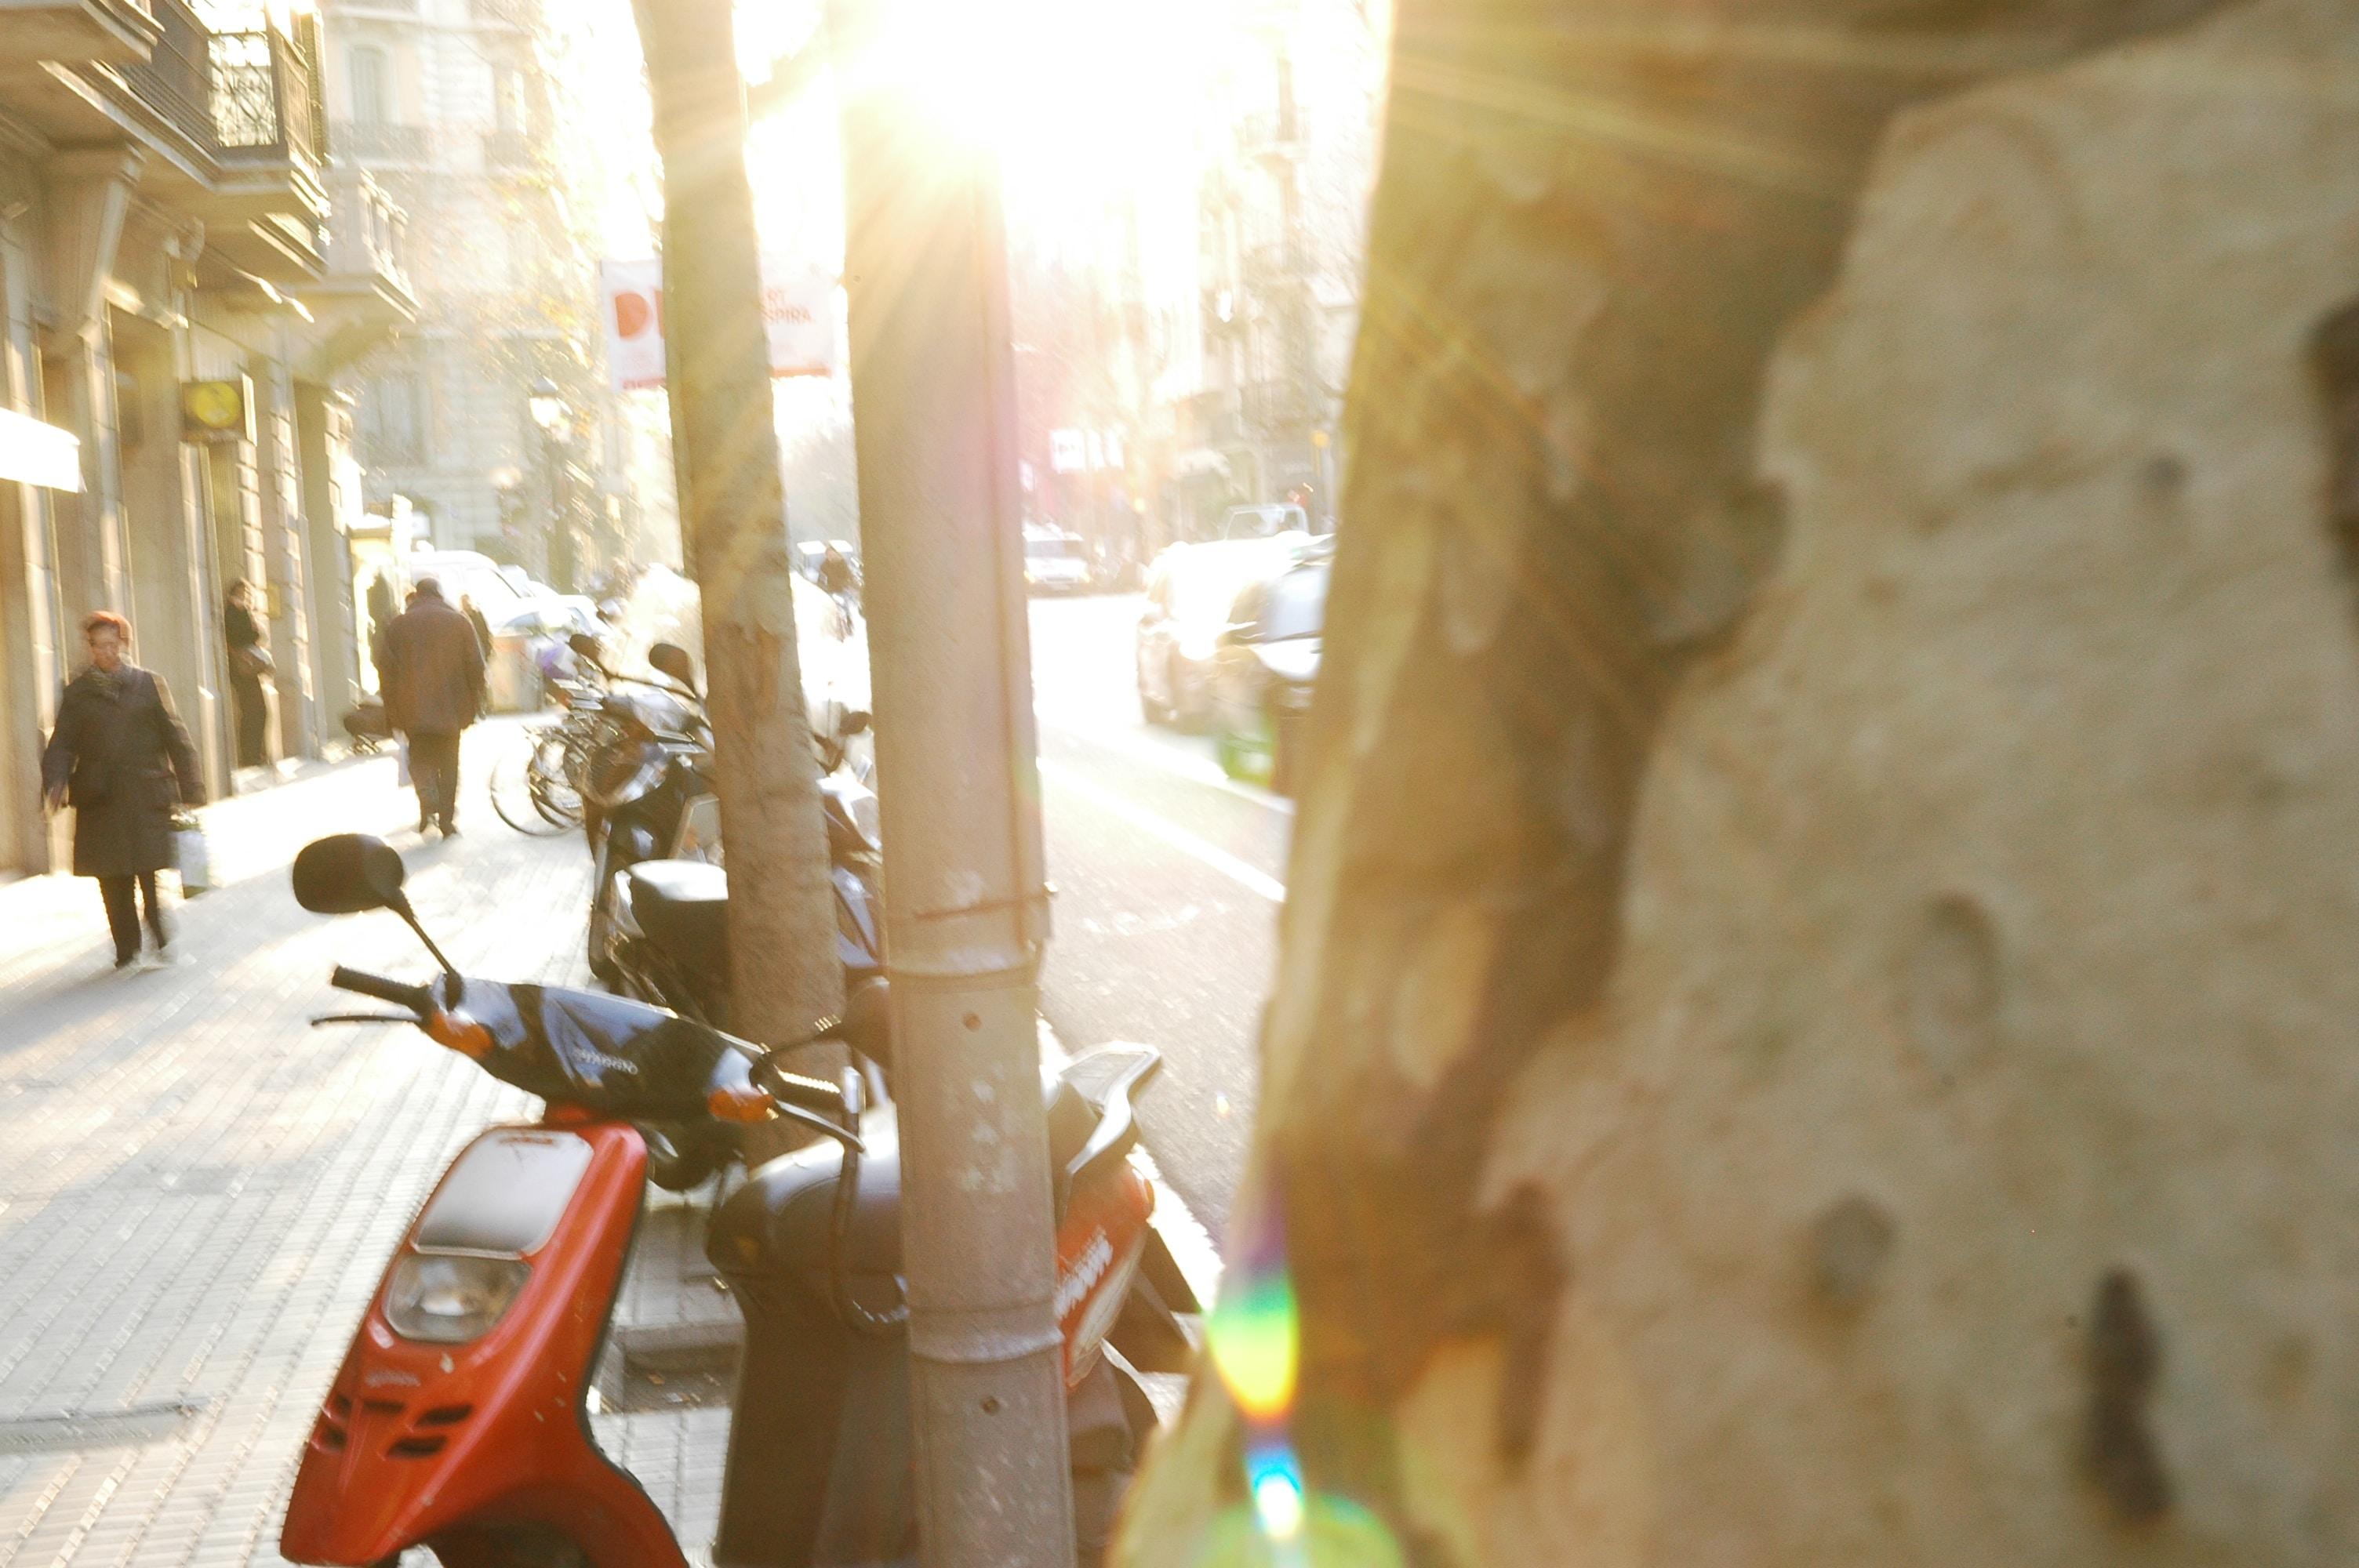 Free Unsplash photo from Ian Sutter